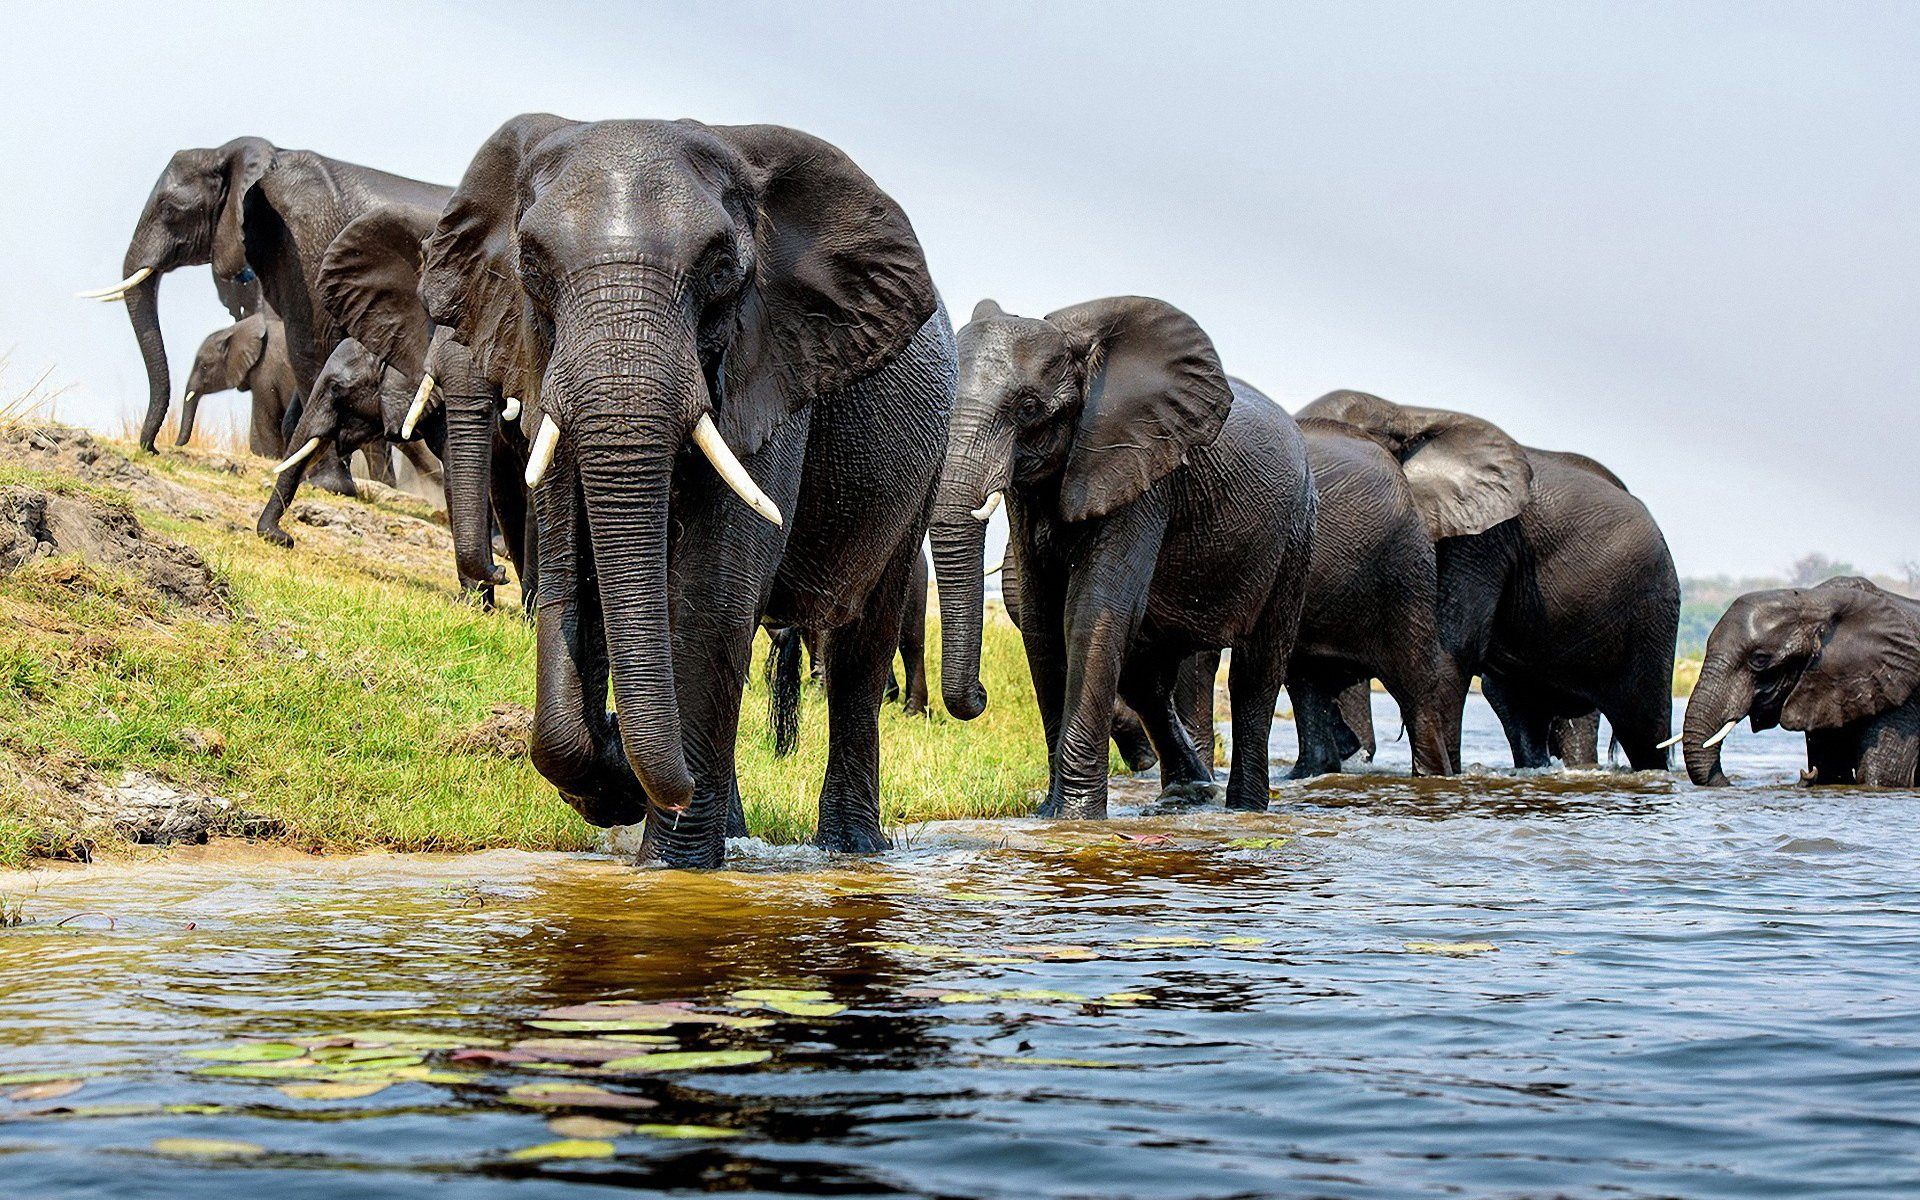 Hd wallpaper elephant - Hd Wallpaper Background Id 565134 1920x1200 Animal Elephant